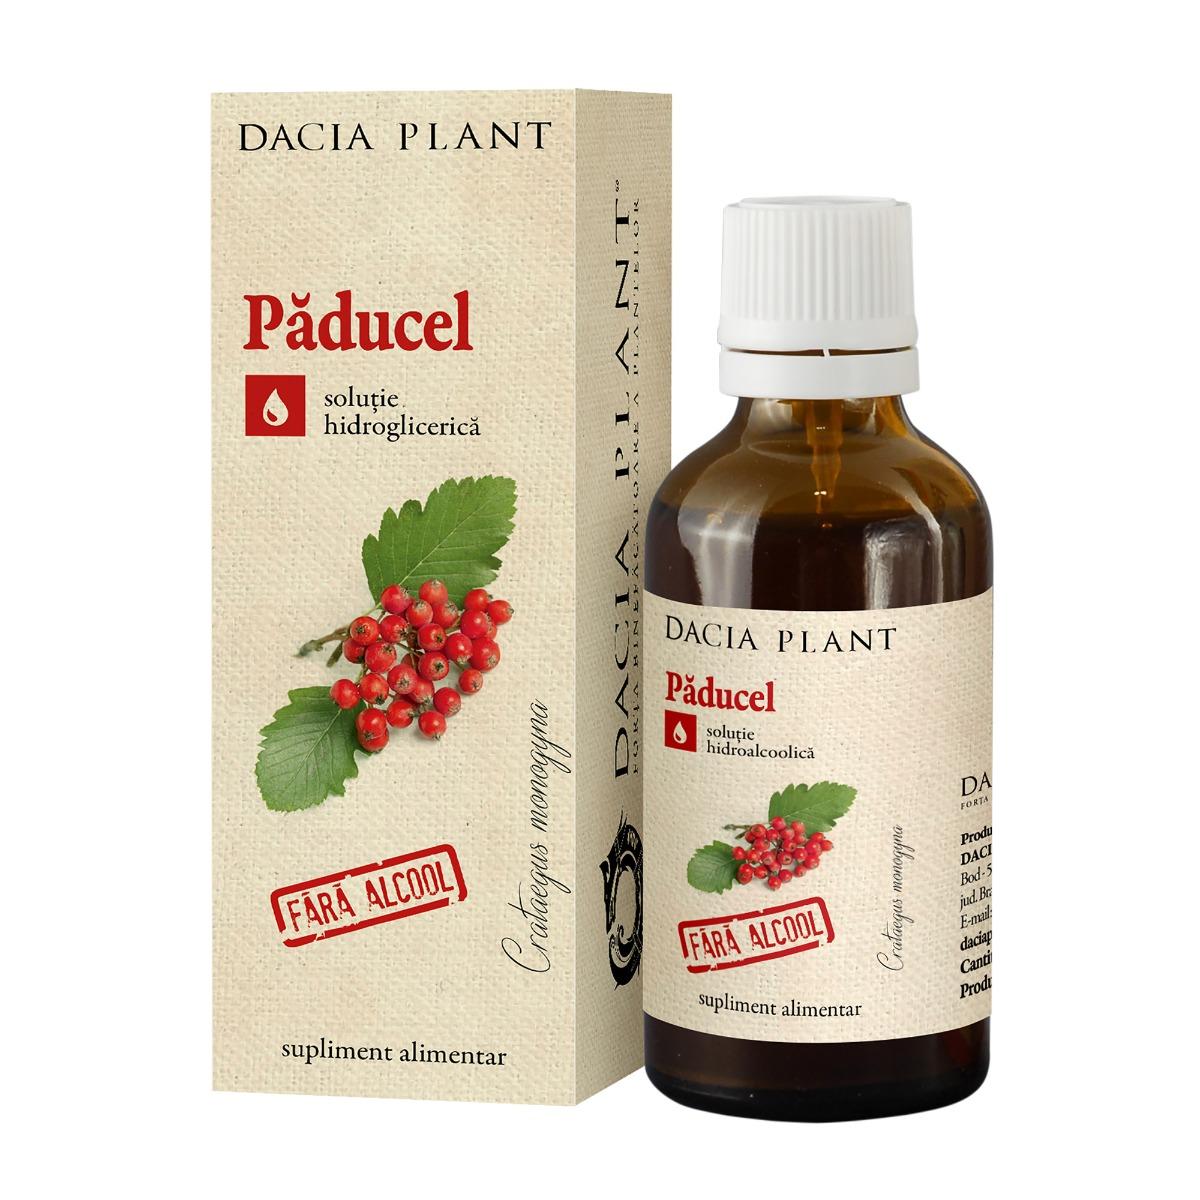 Paducel tinctura fara alcool, 50ml, Dacia Plant drmax.ro